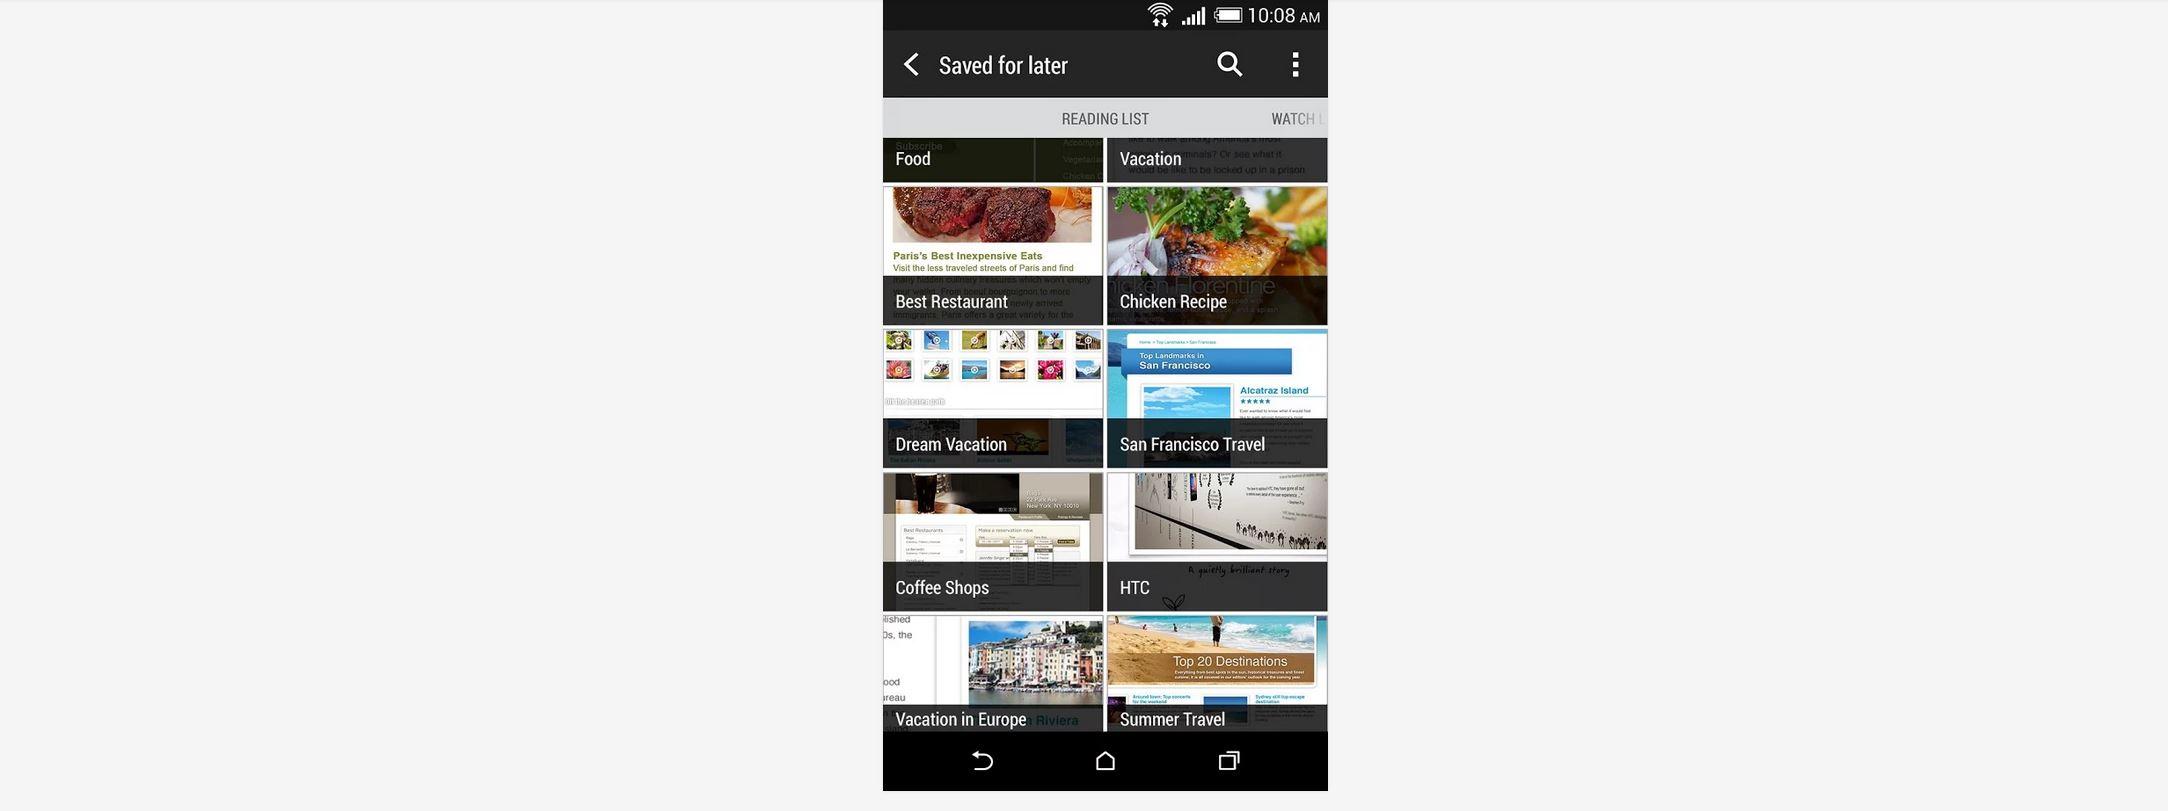 Photo of Download HTC Sense Internet Browser 7.1.2515232157.apk